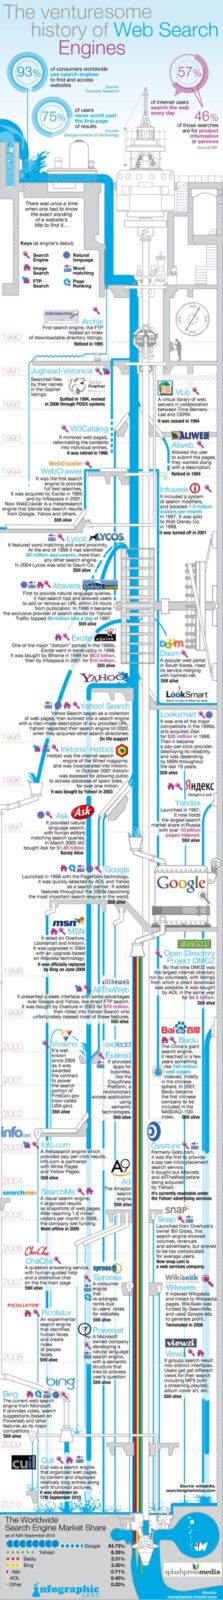 Inphographics - la historia de los motores de búsquedas